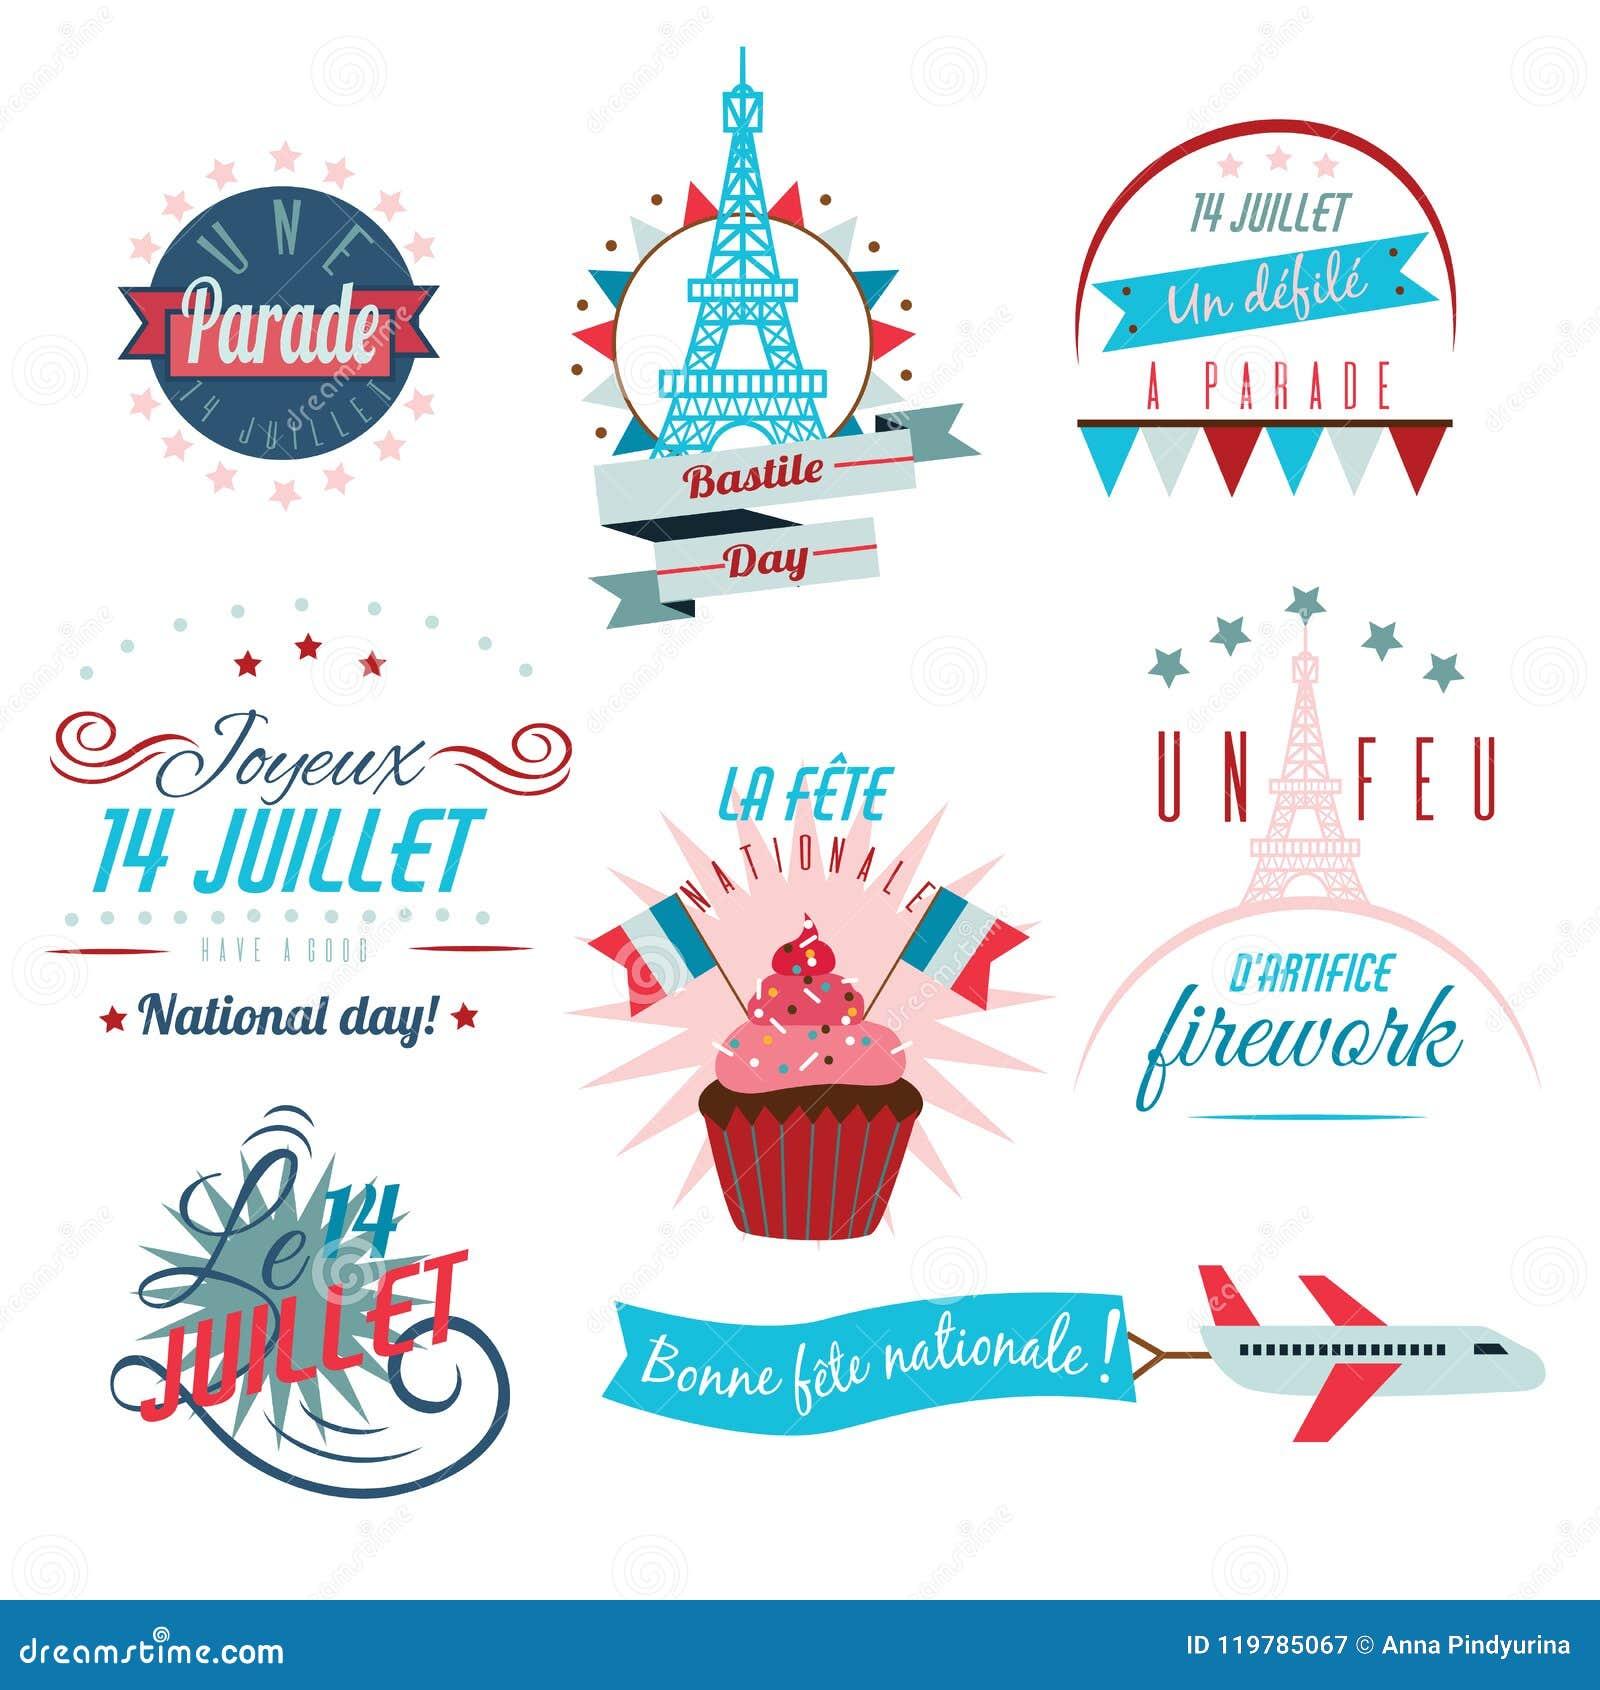 Bastille Day celebrations in Australia - La France en